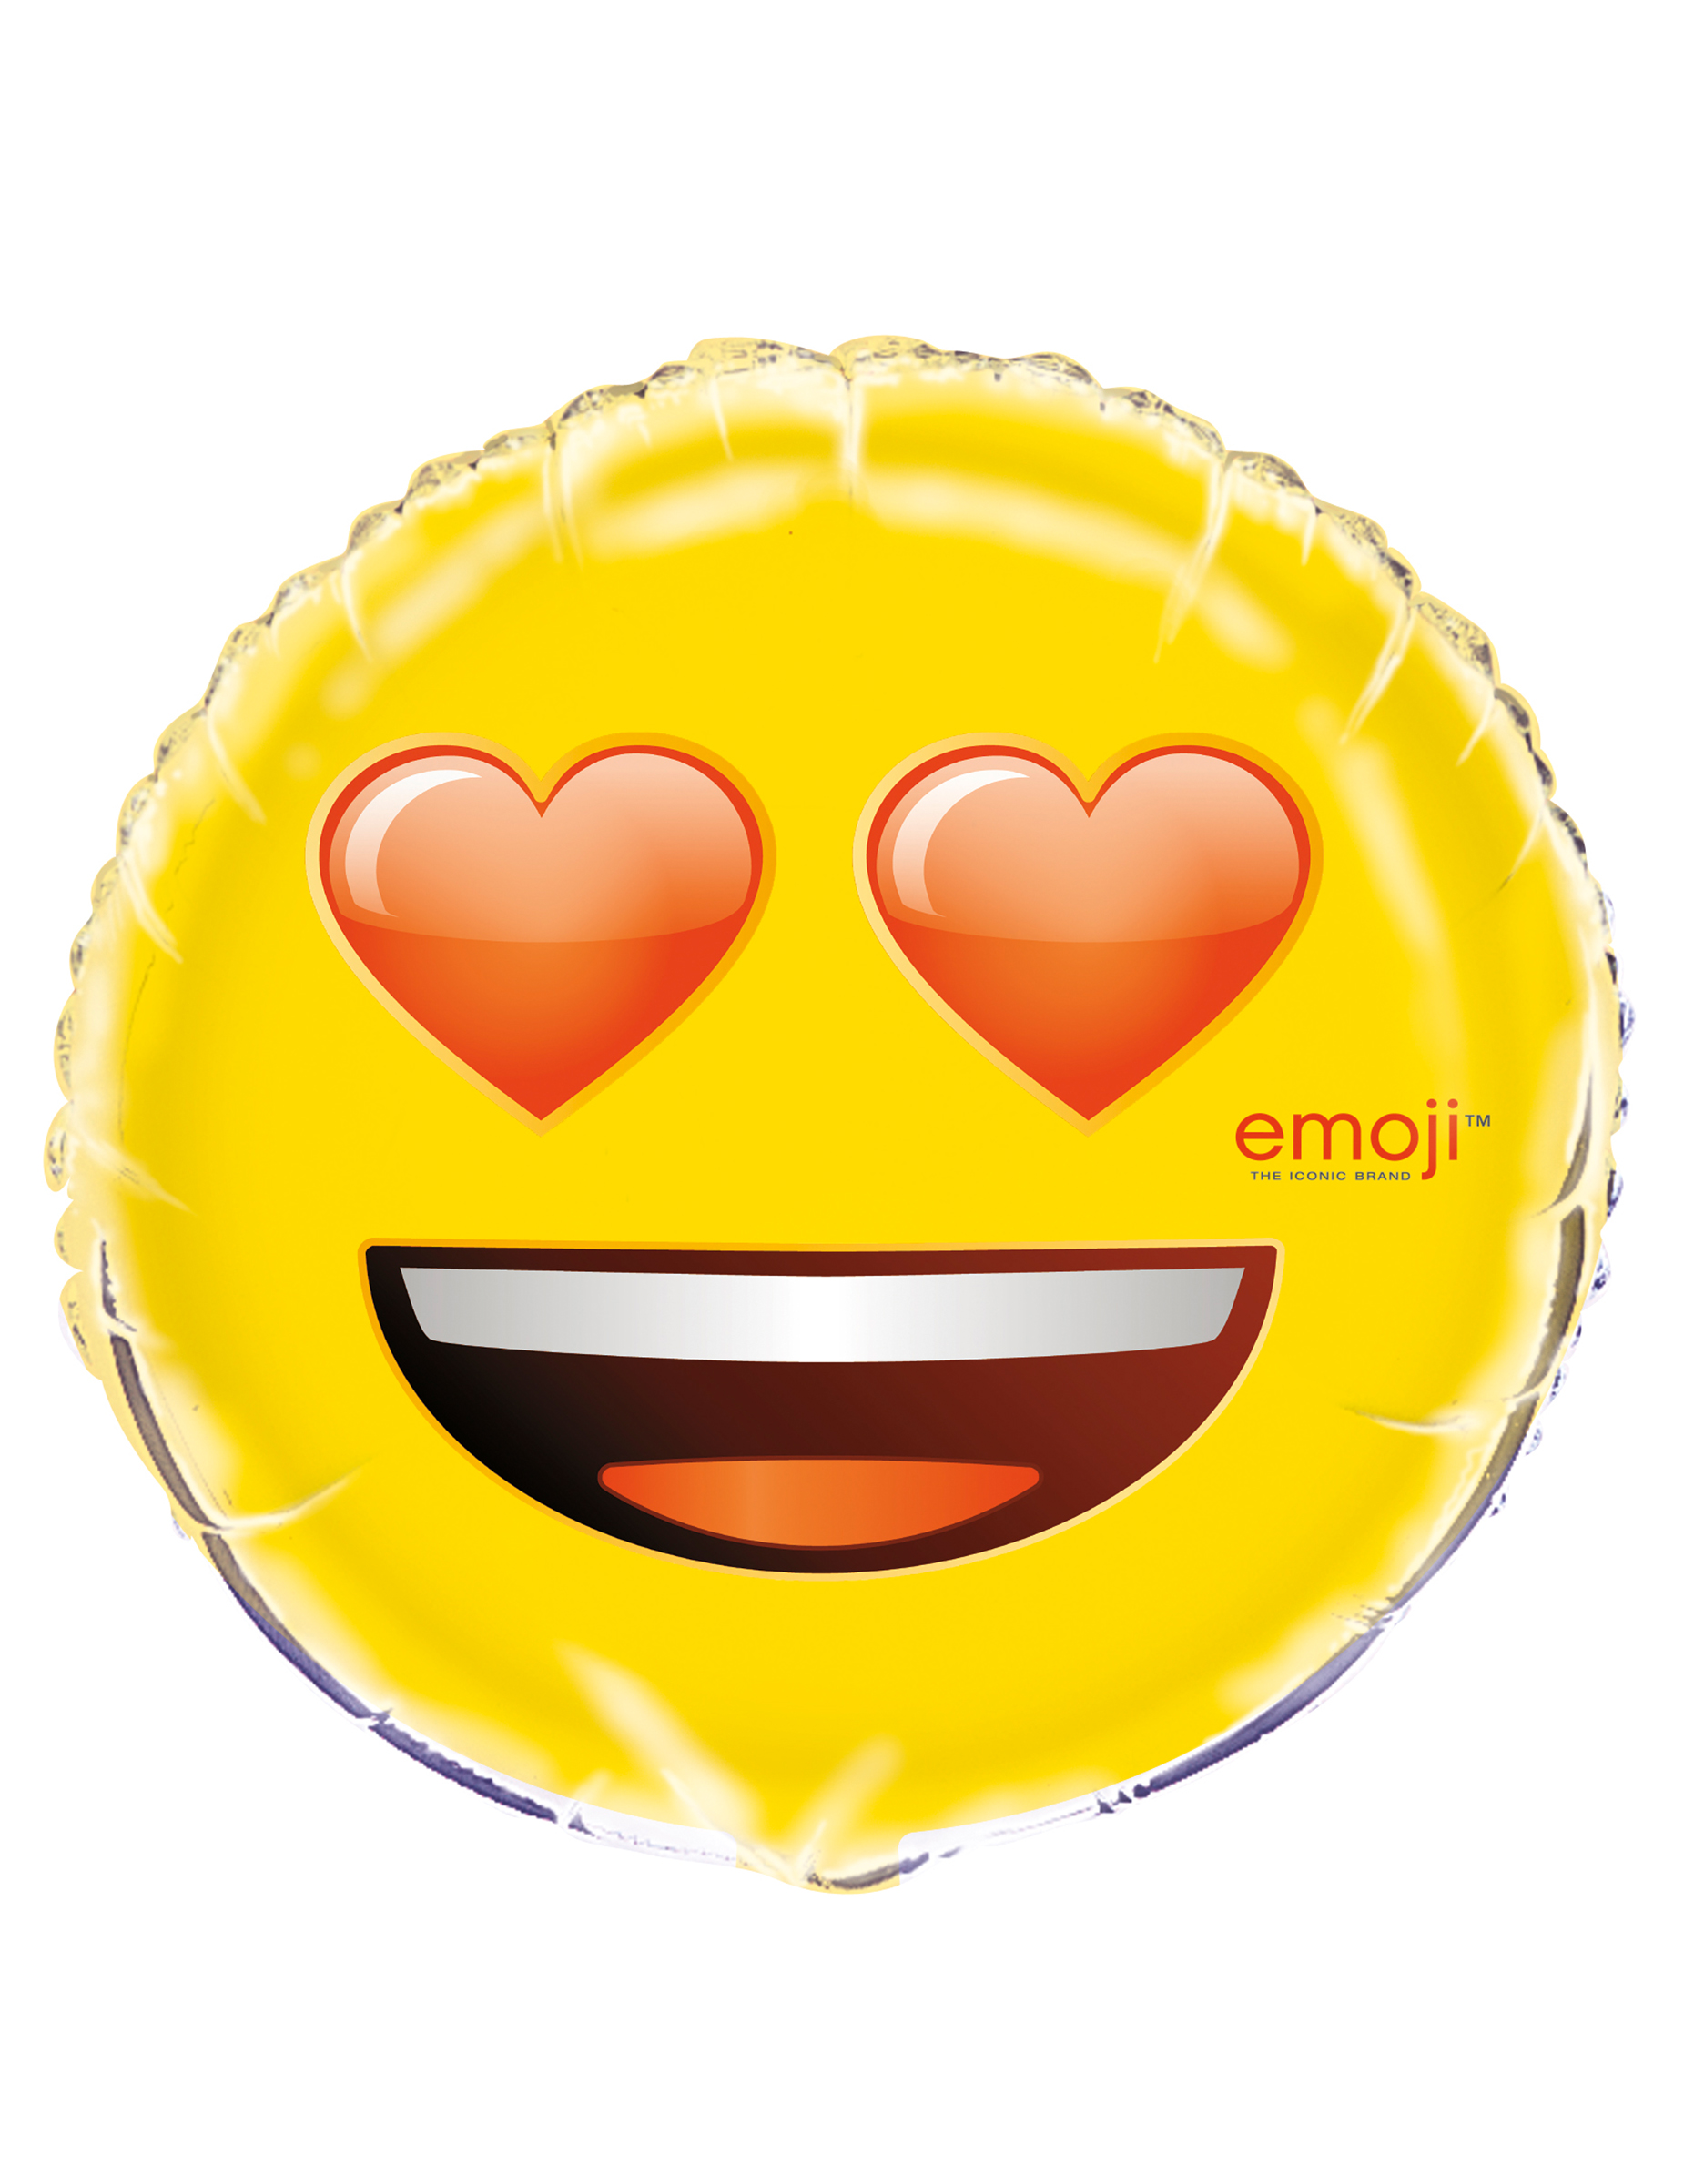 Emoji Folienballon Gelb Gunstige Faschings Partydeko Zubehor Bei